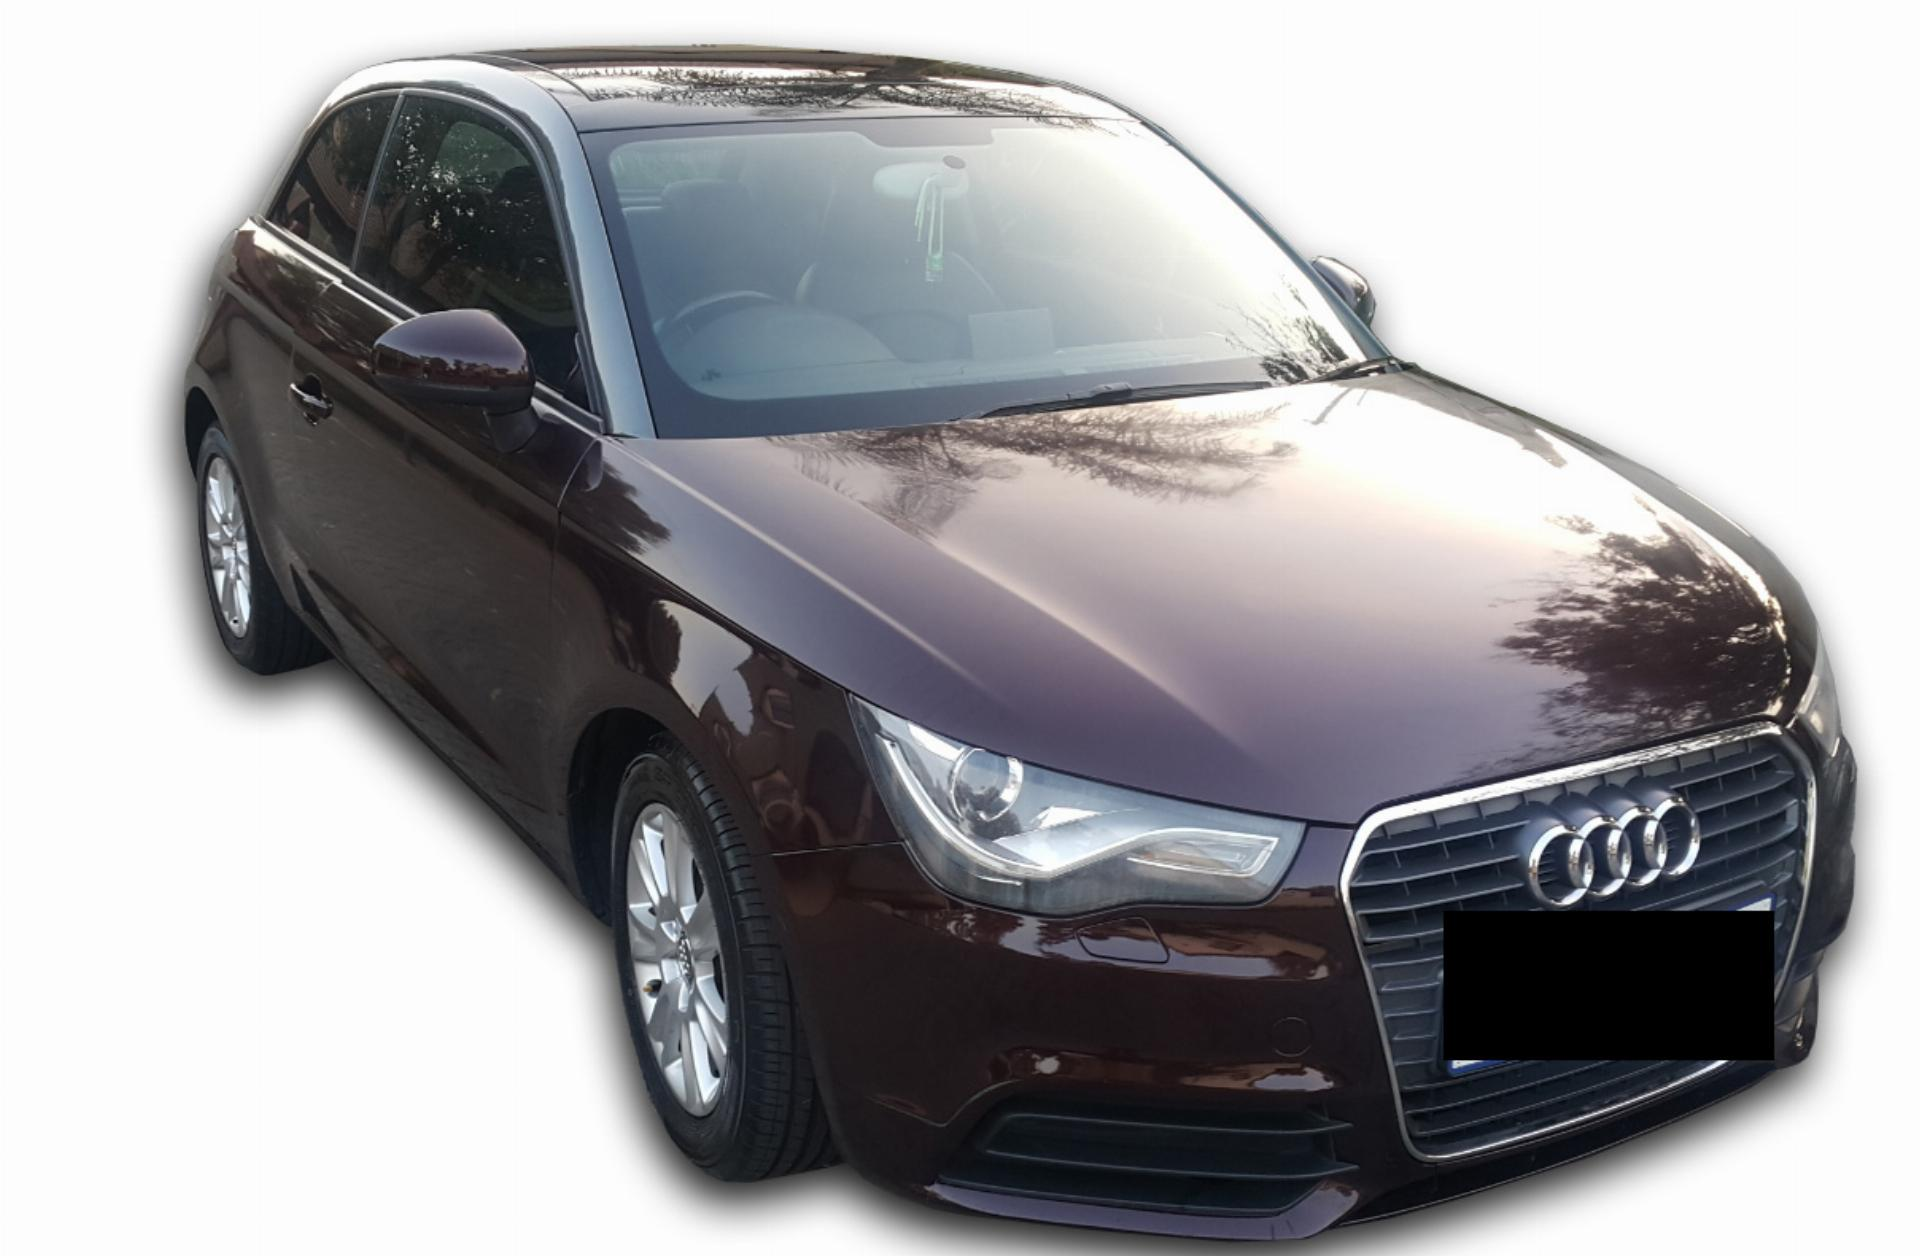 Audi A1 1.4 Fsi Ambition 3-DOOR